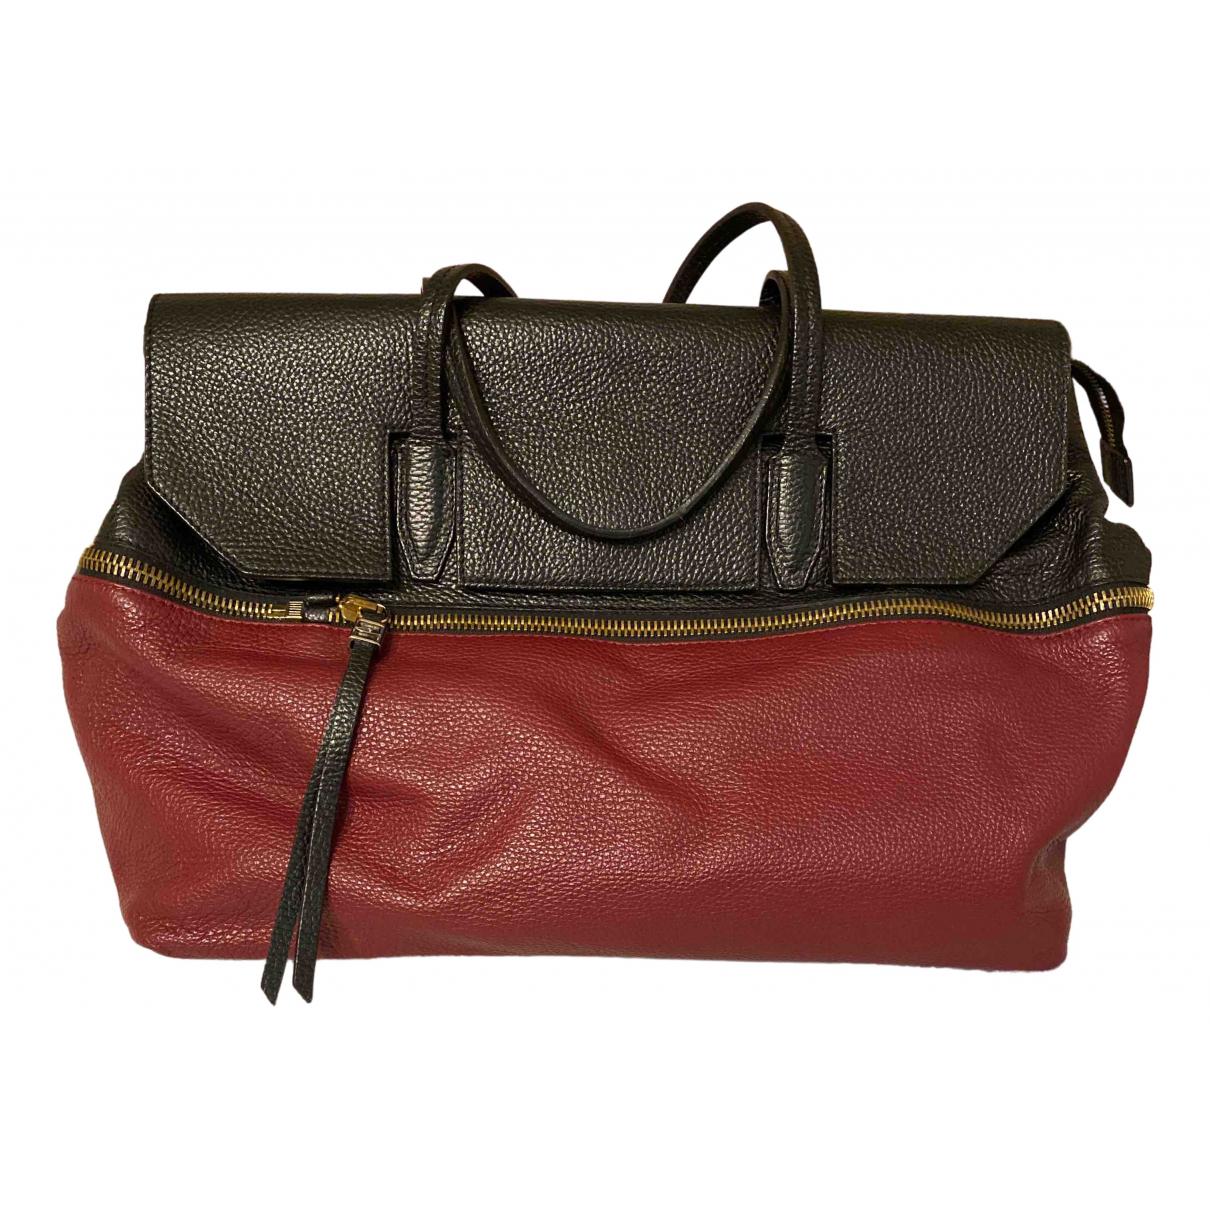 Gianni Chiarini \N Burgundy Leather handbag for Women \N